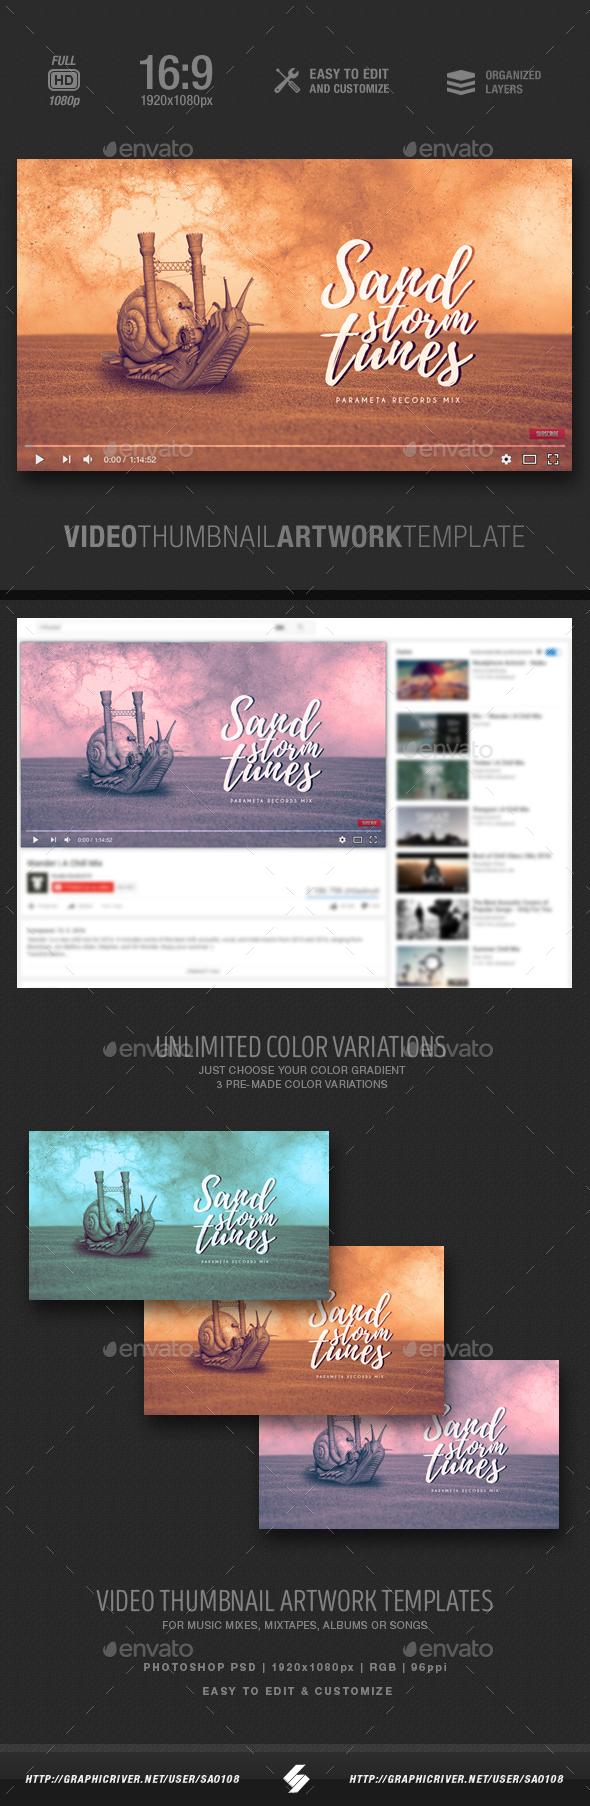 Sandstorm Tunes - Music Video Thumbnail Artwork Template - YouTube Social Media